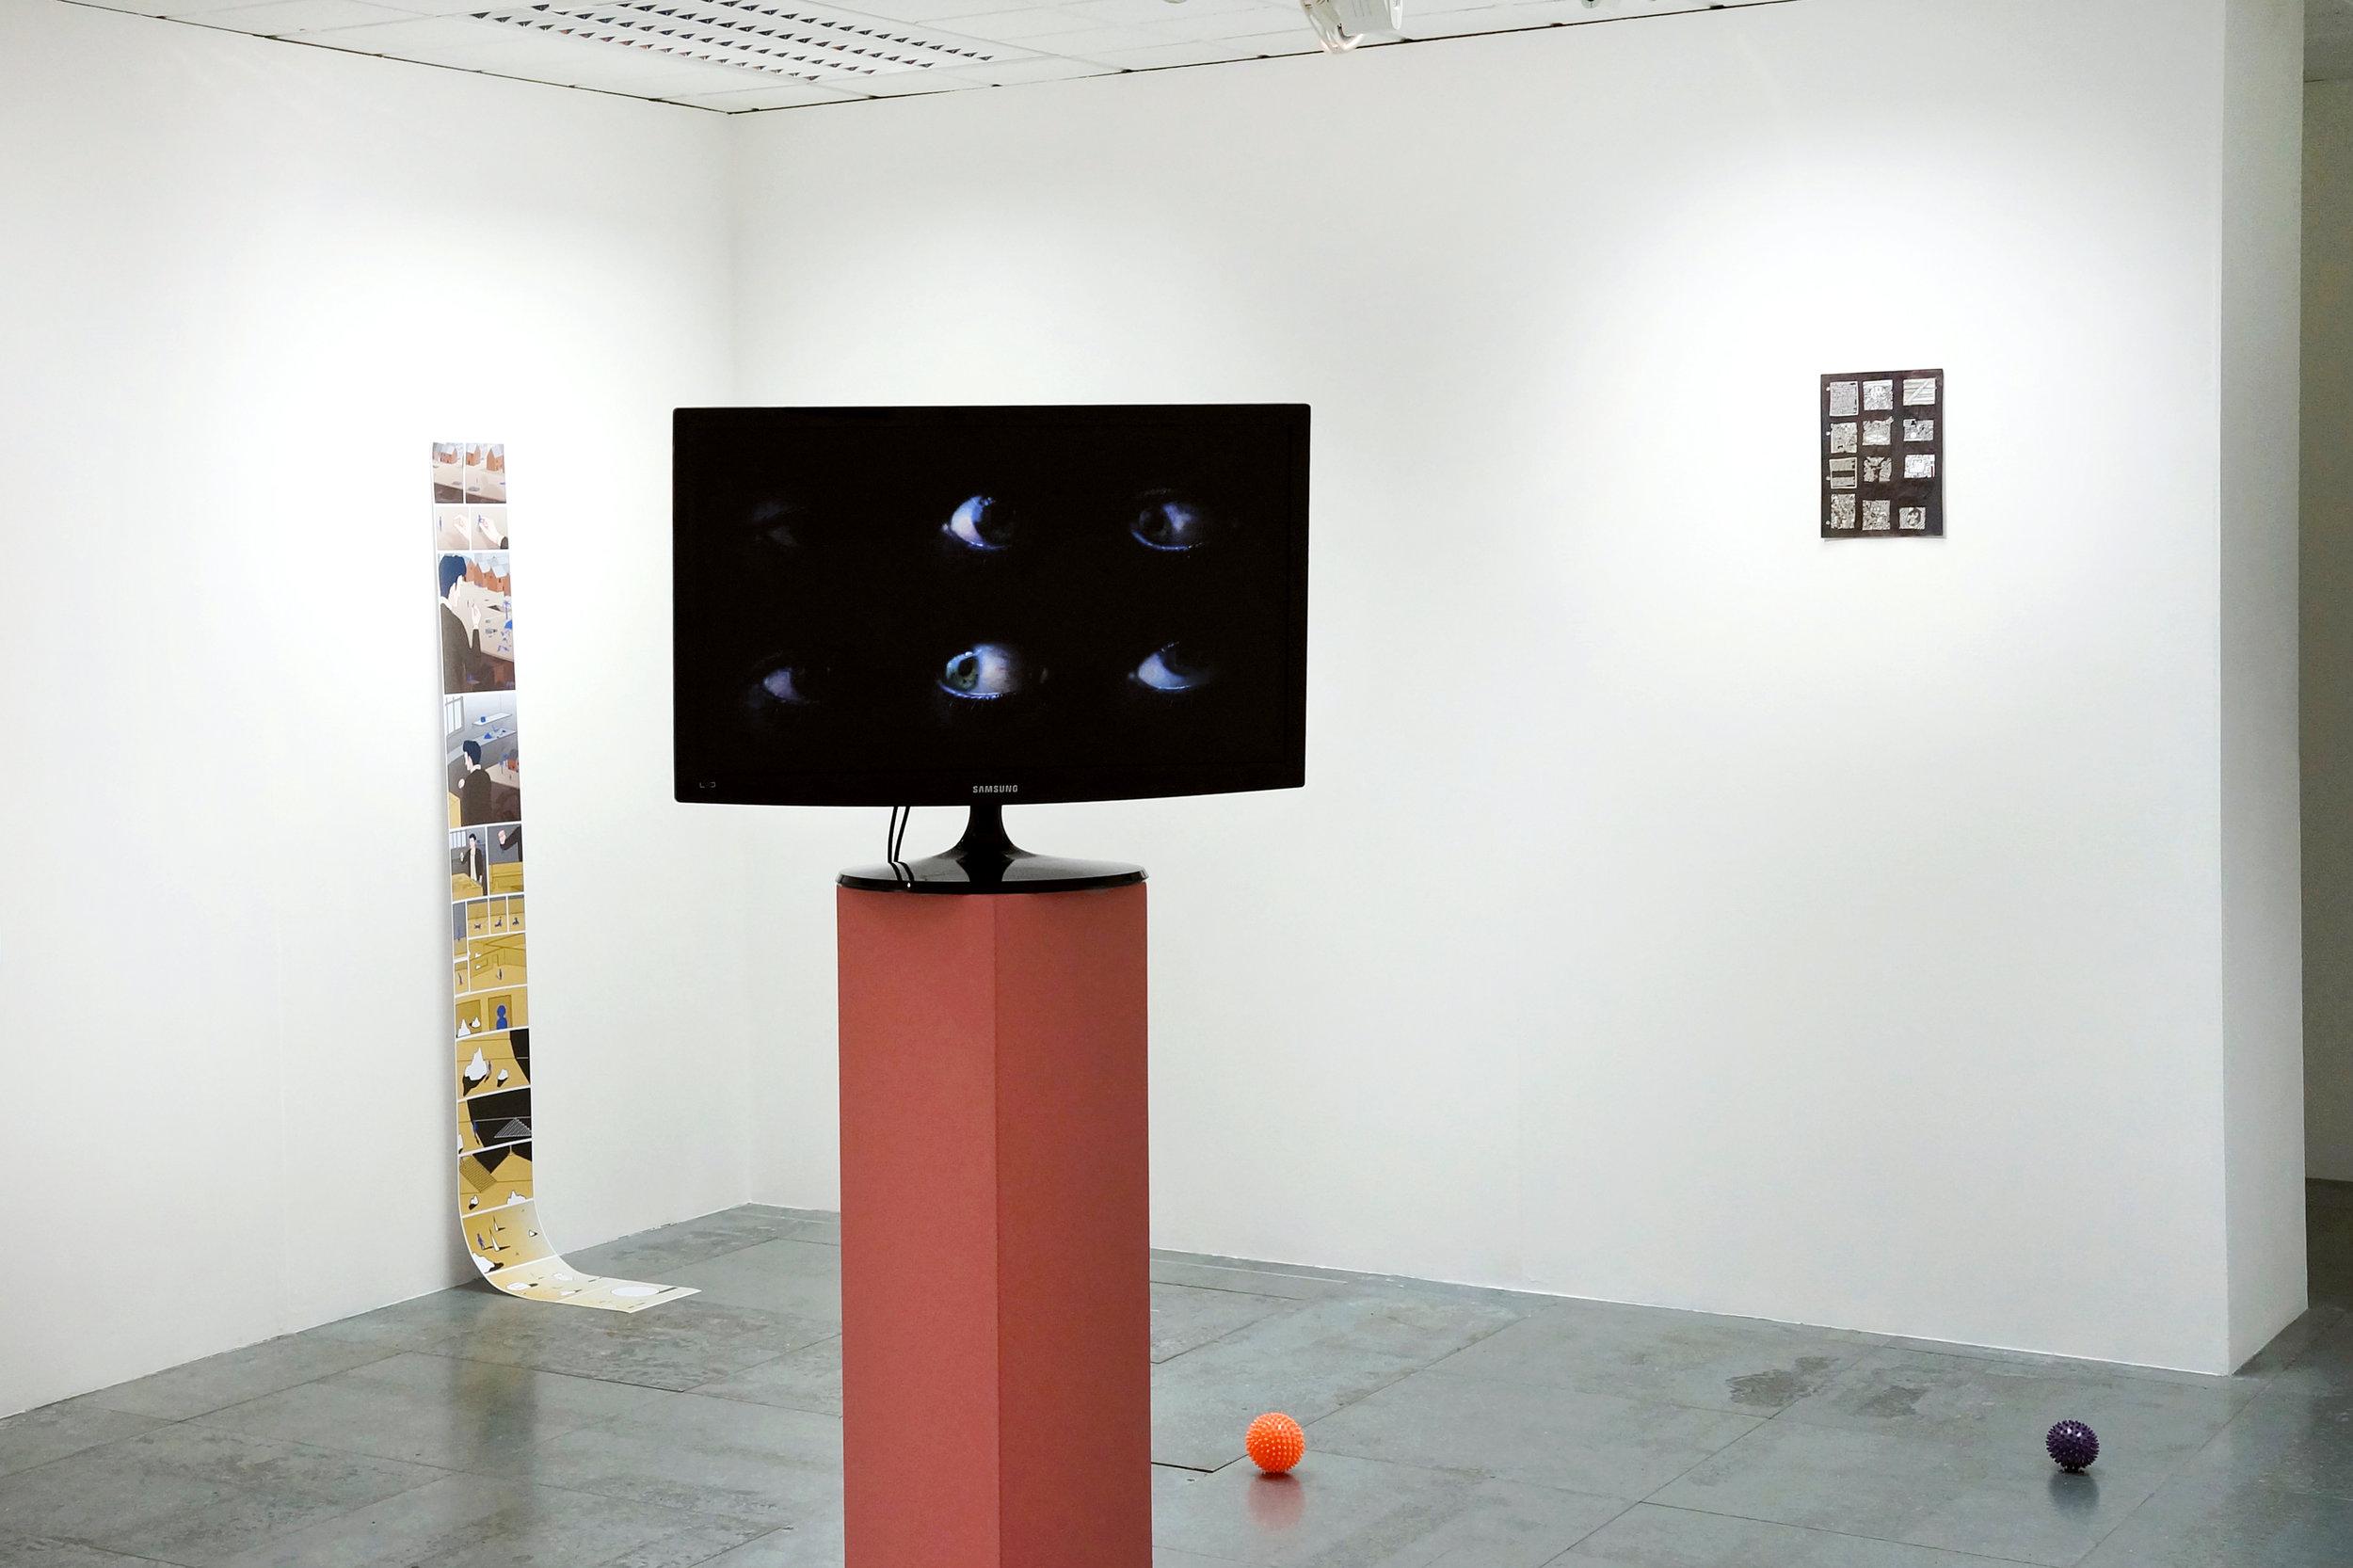 Matt Wilkinson,  Composition i , video, 2014, exhibited in  Dialogus .